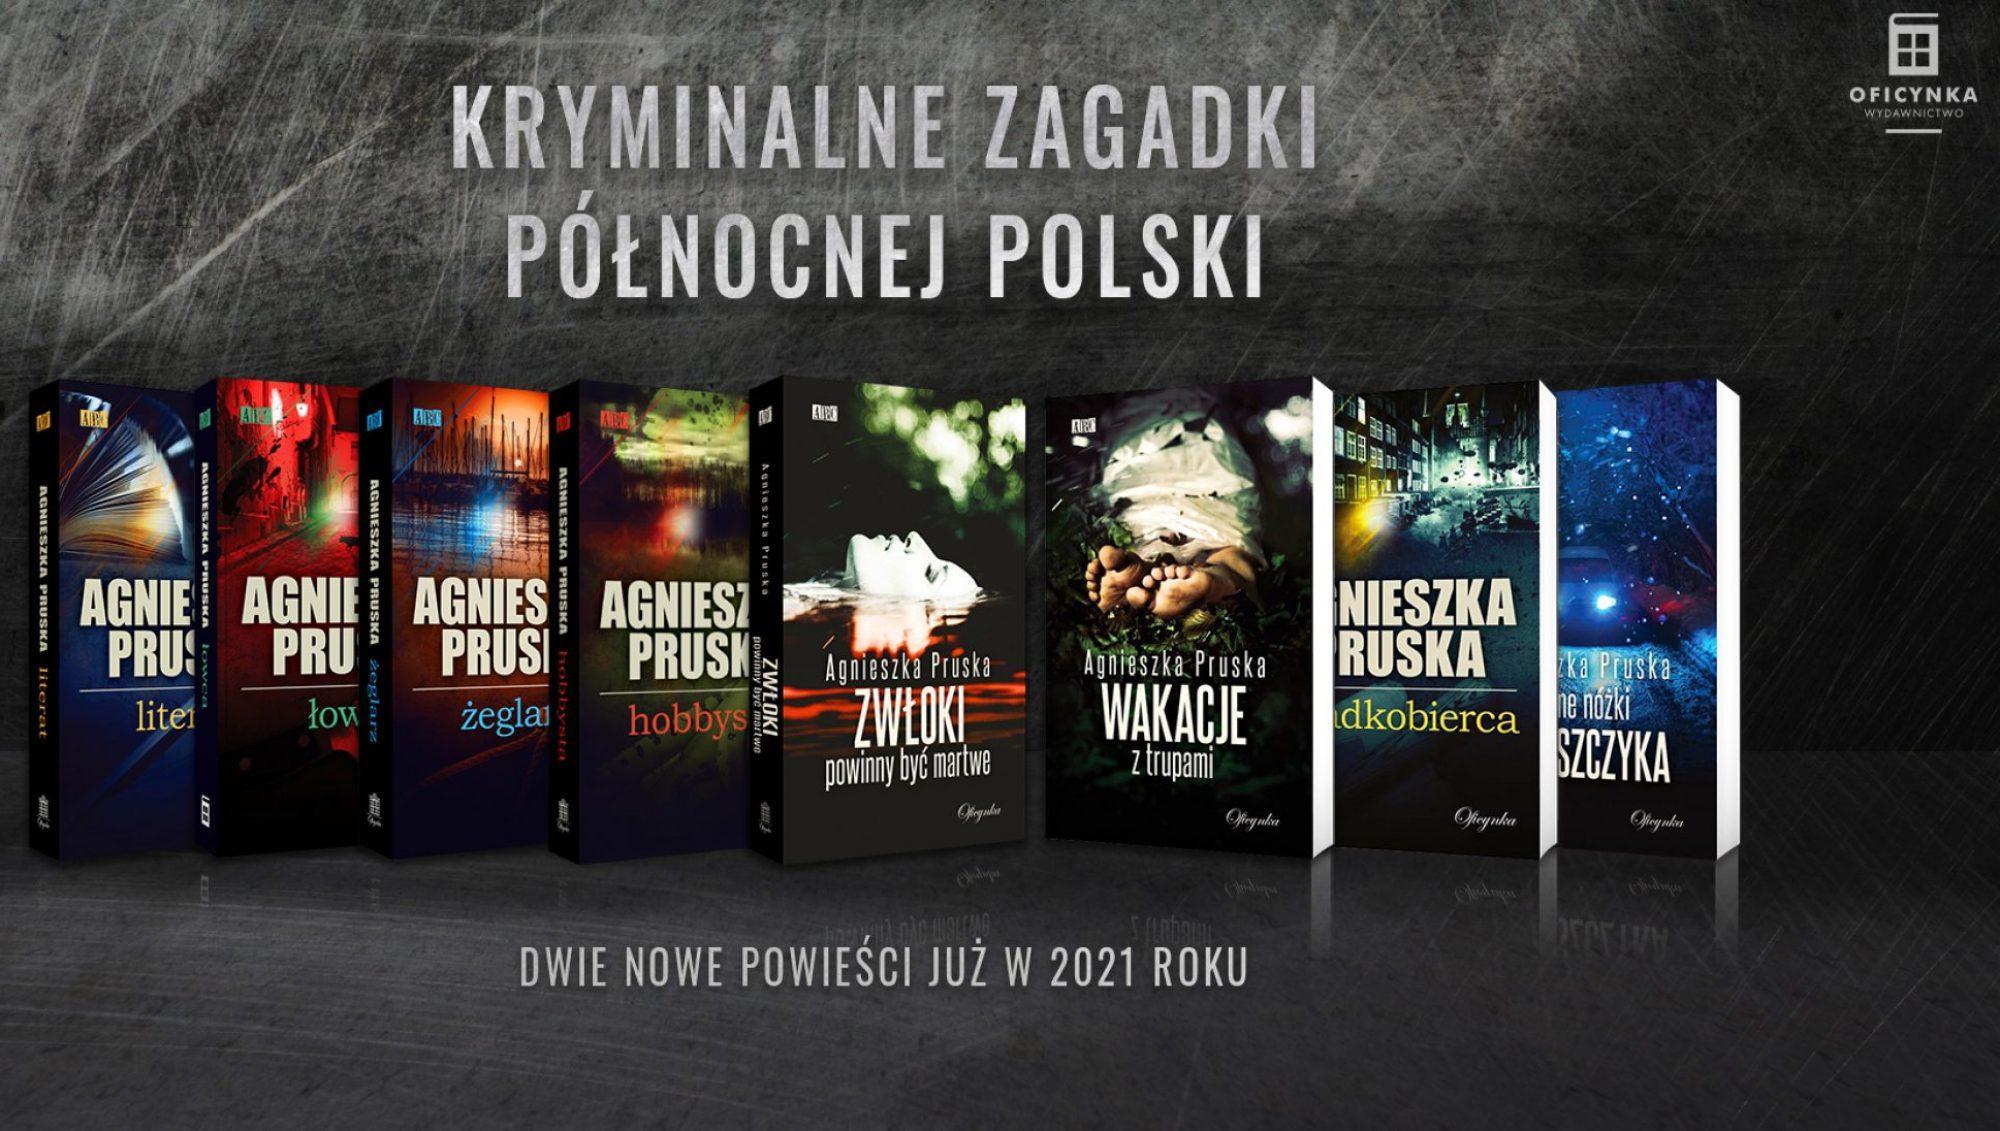 Agnieszka Pruska - pisarka